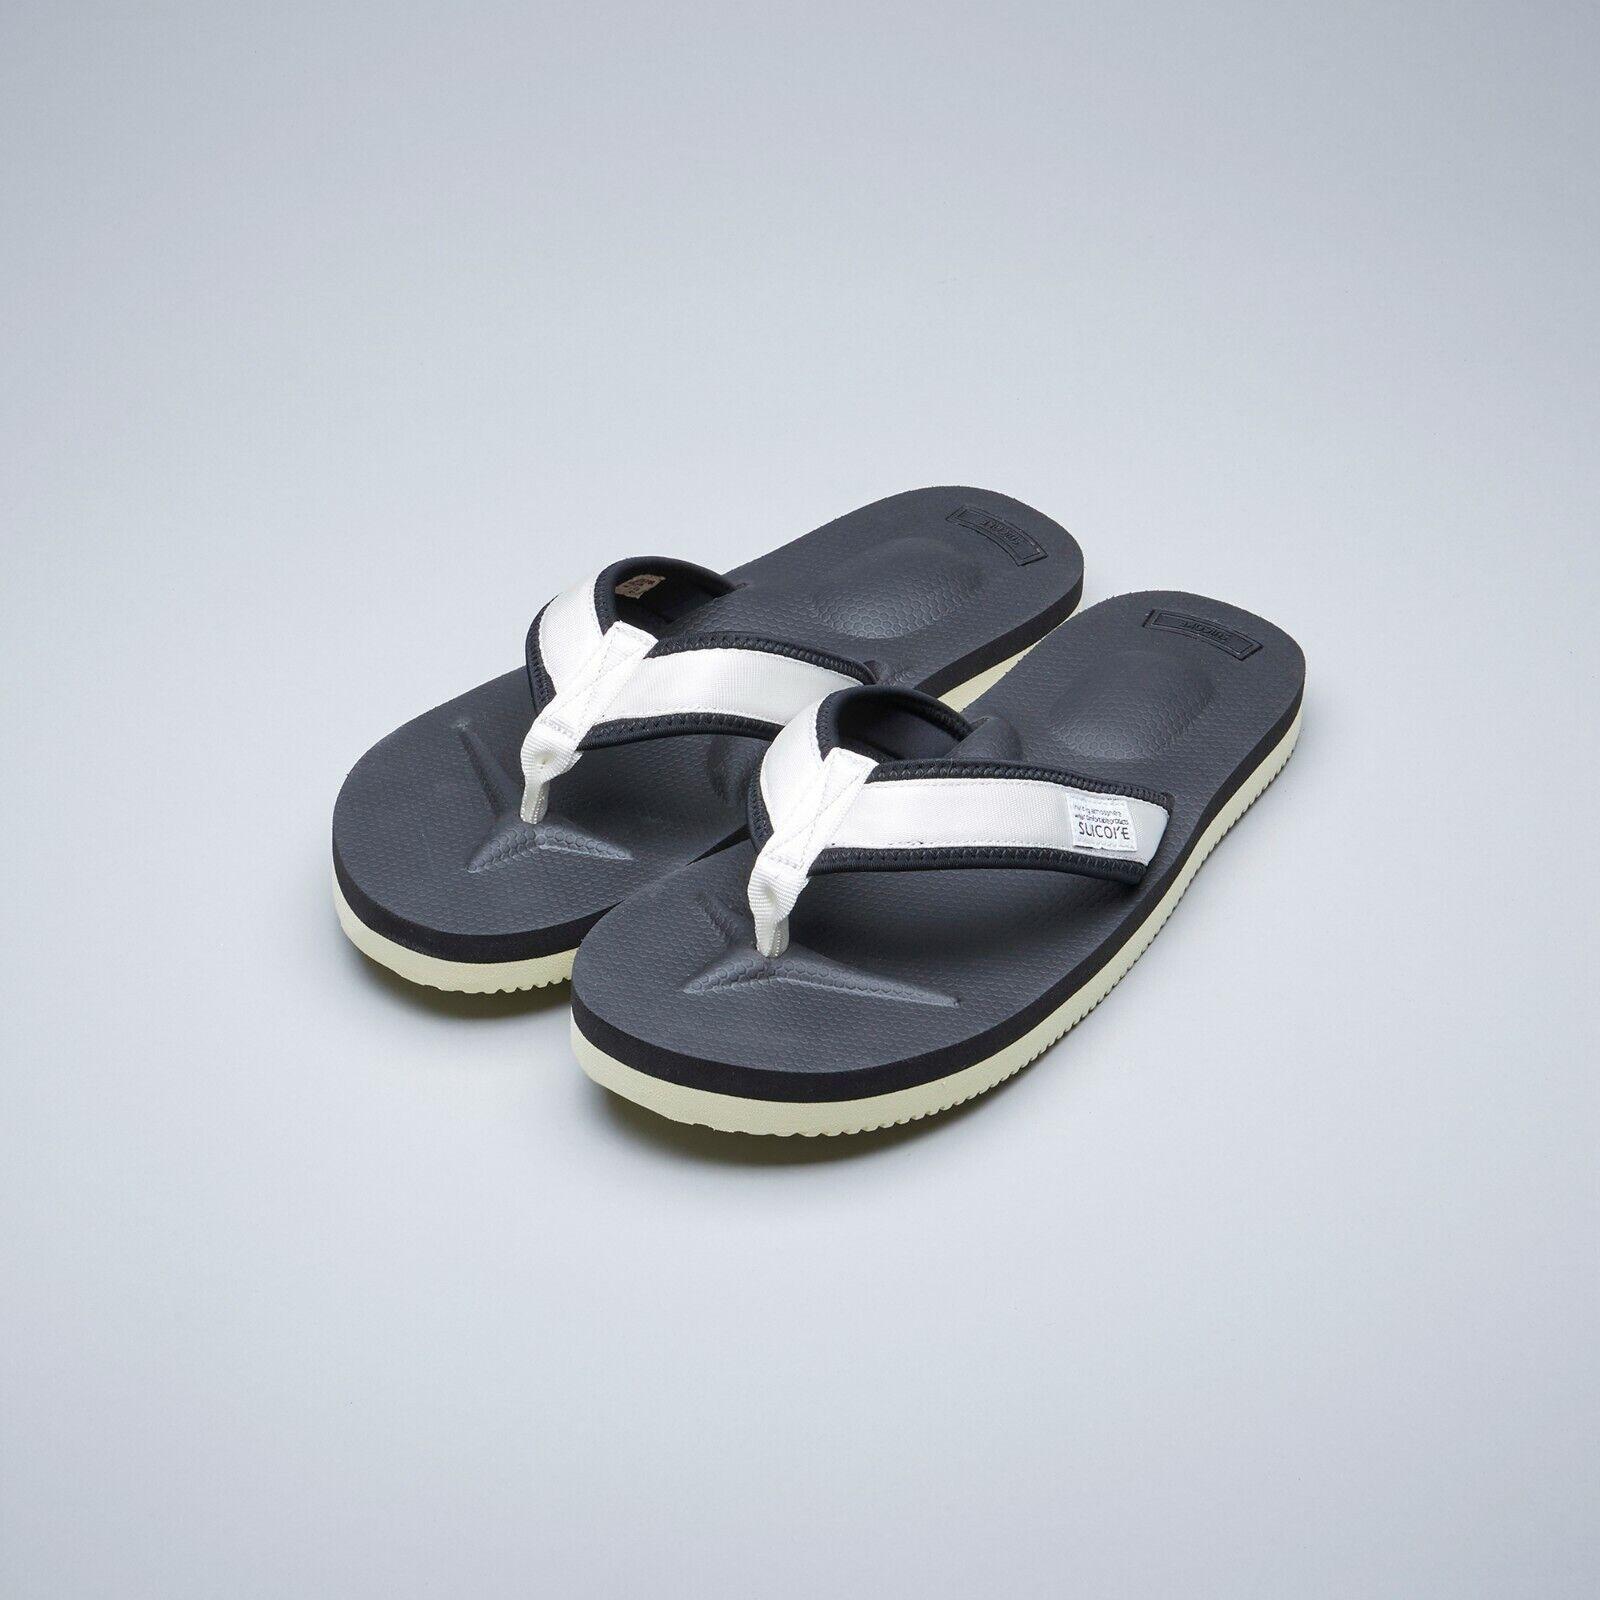 Suicoke OG-021V2 tono-V2 Suela Vibram de Nylon blancoo Zapatillas Sandalias Diapositivas